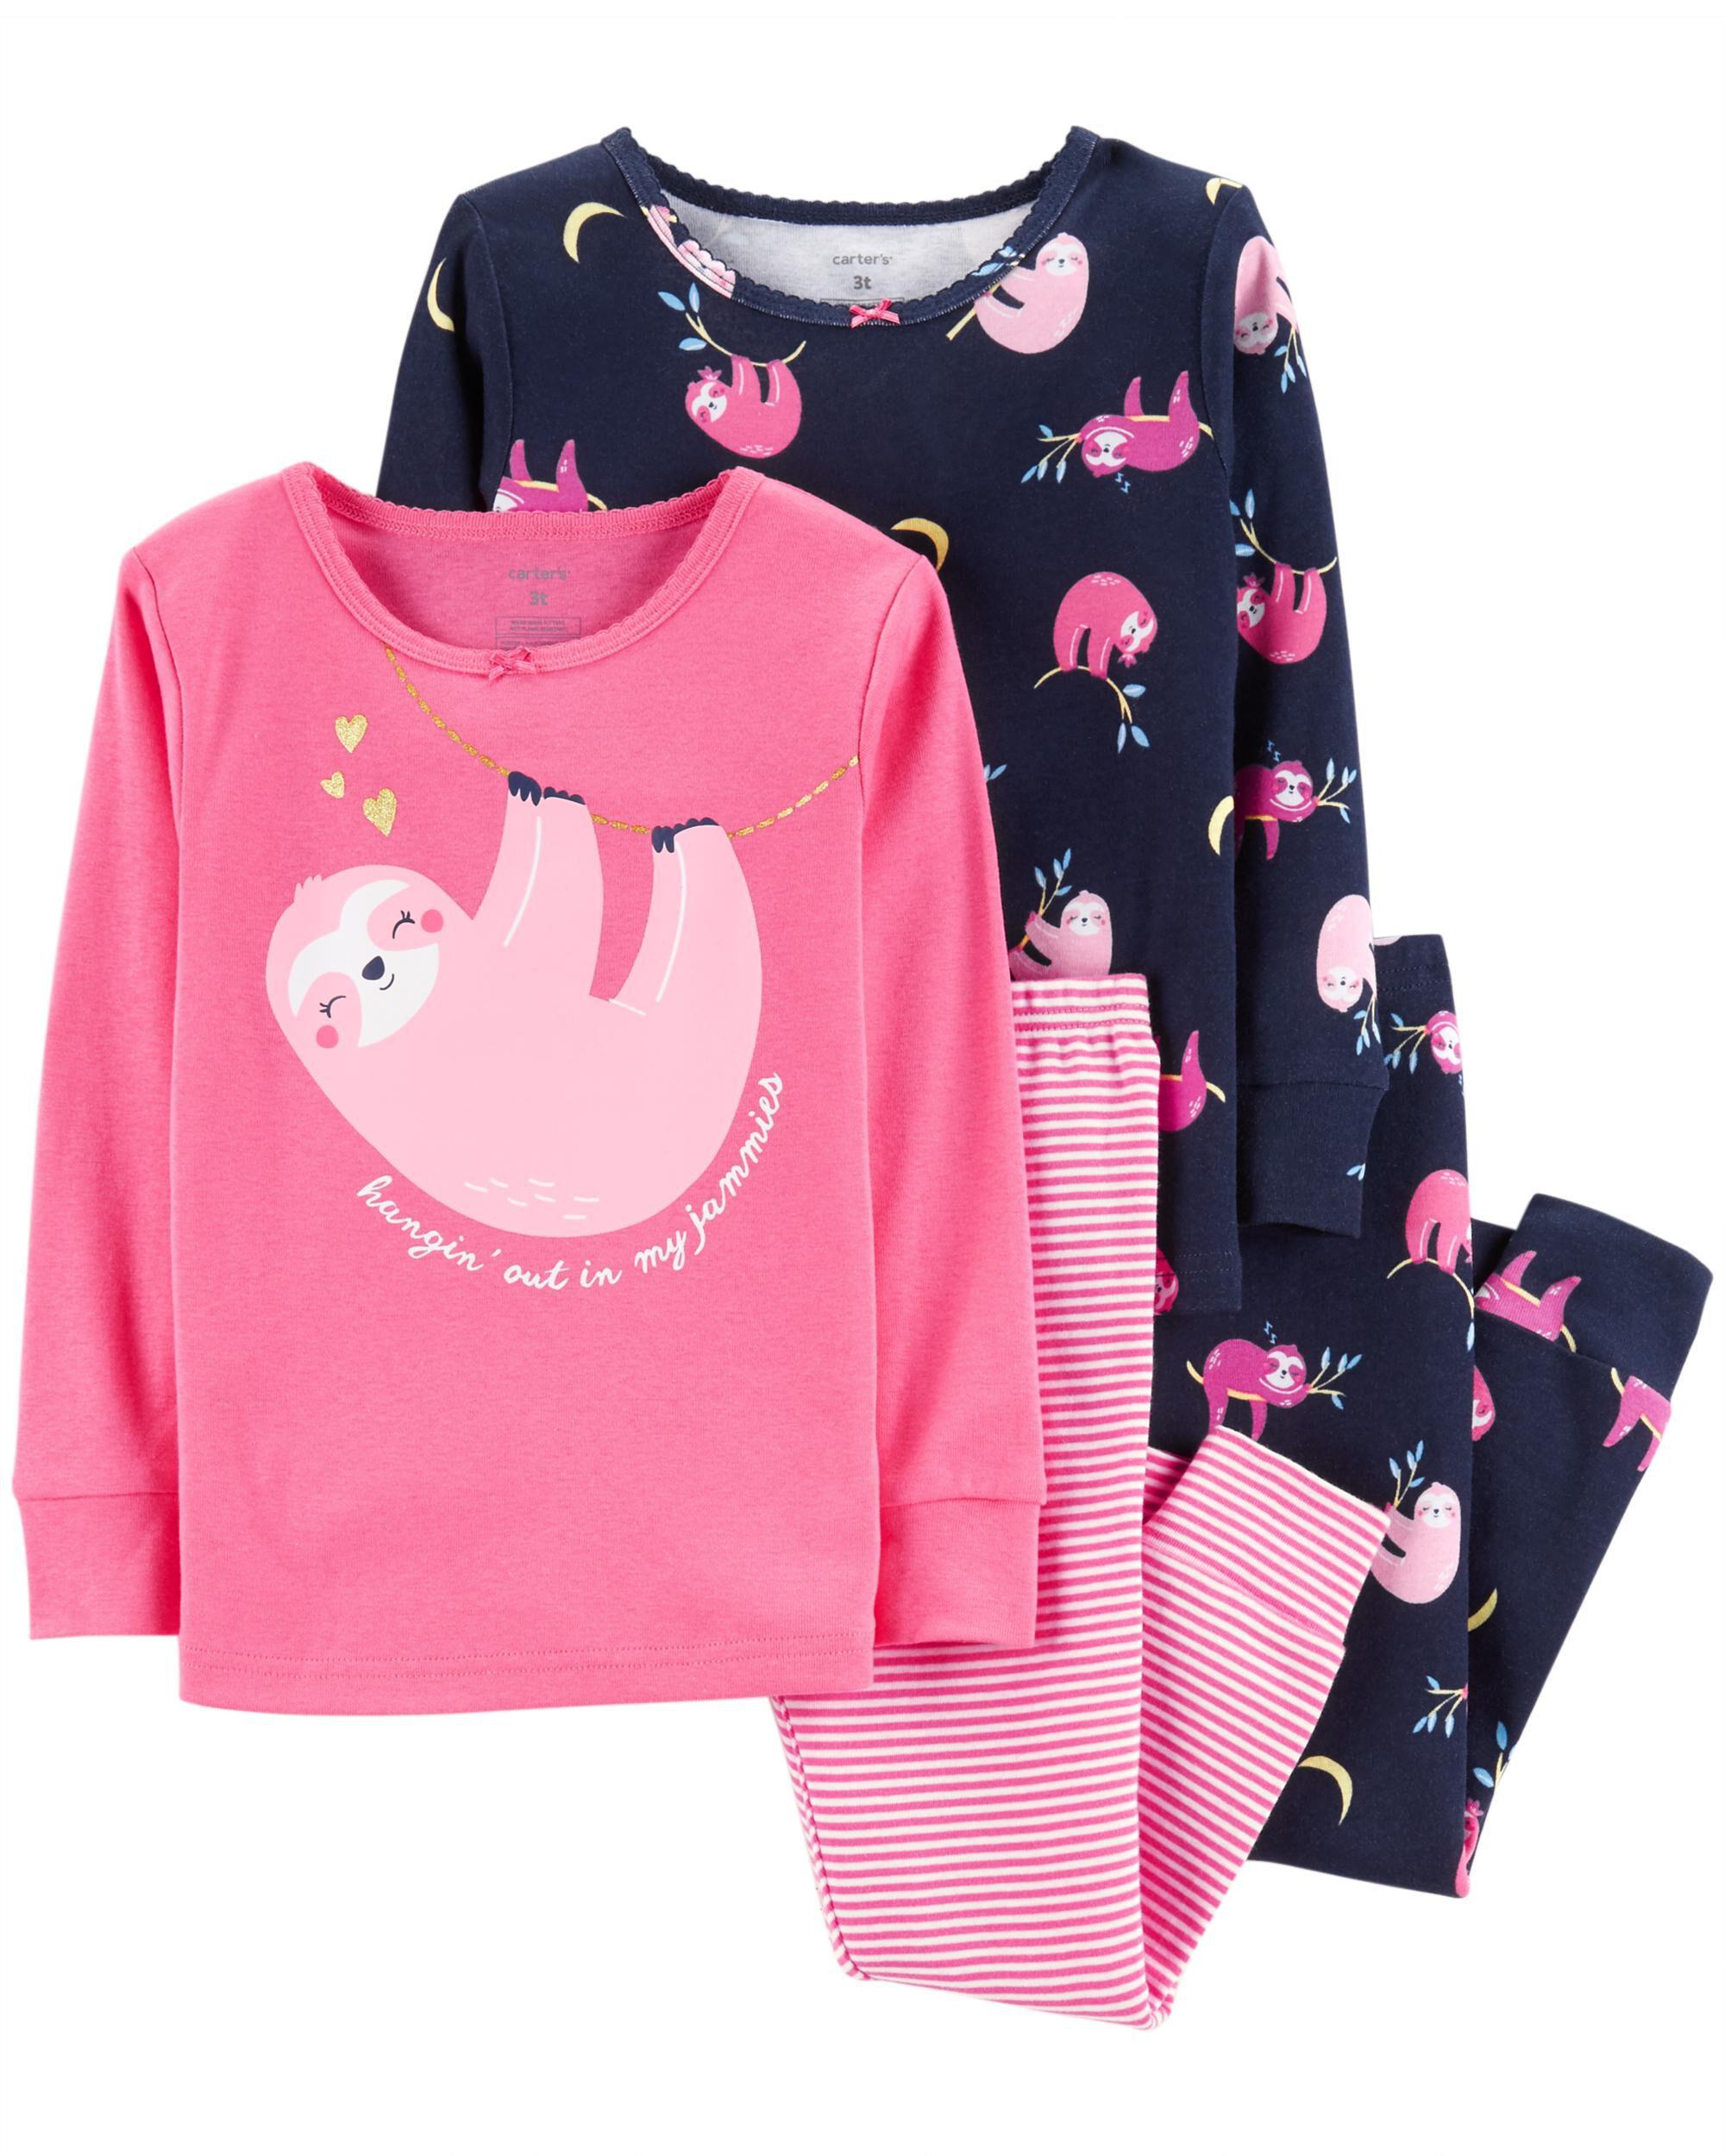 Carters Toddler Girl 4-Piece Short Long Sleeves PJs 4pc Pajamas Set Sleepwear 4T